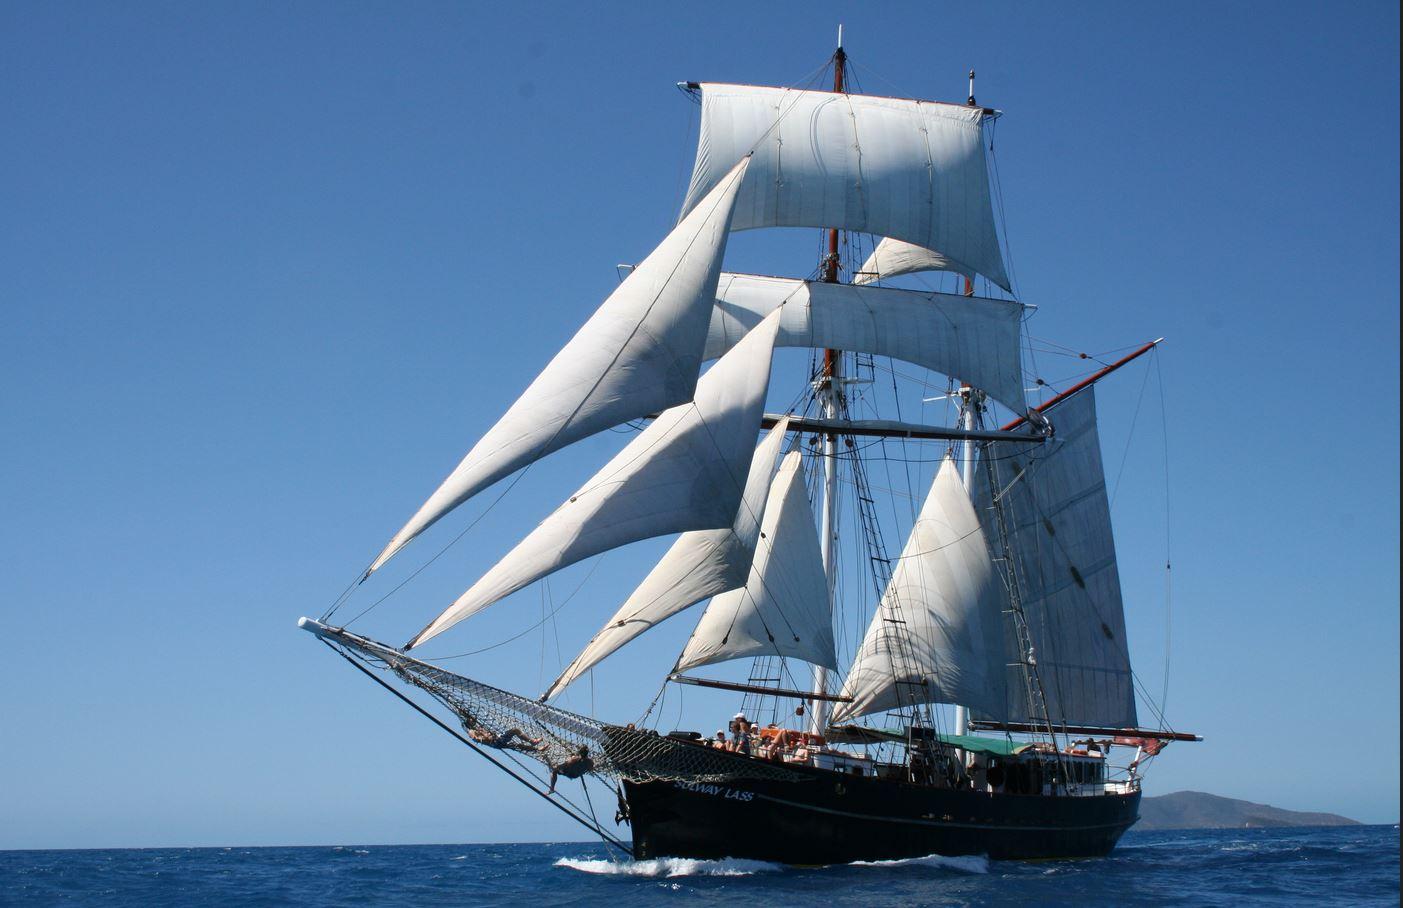 tall-ship-sailing-whitsundays - Australia Liveaboard